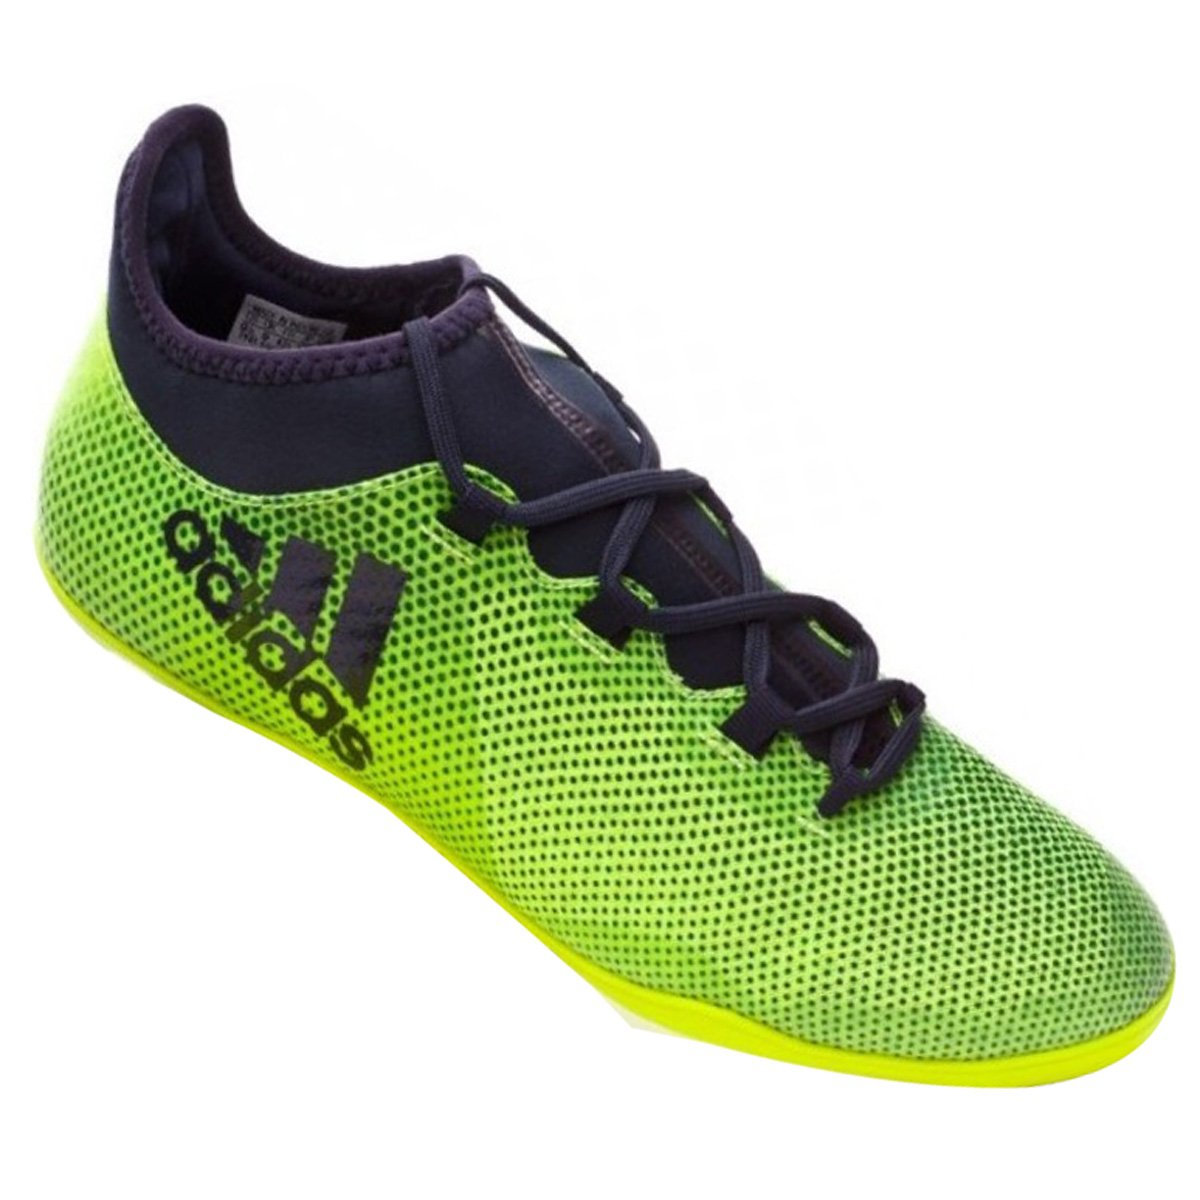 3d872173b Indoor Masculino Adidas X Tango 17.3 CG3717 Verde Preto